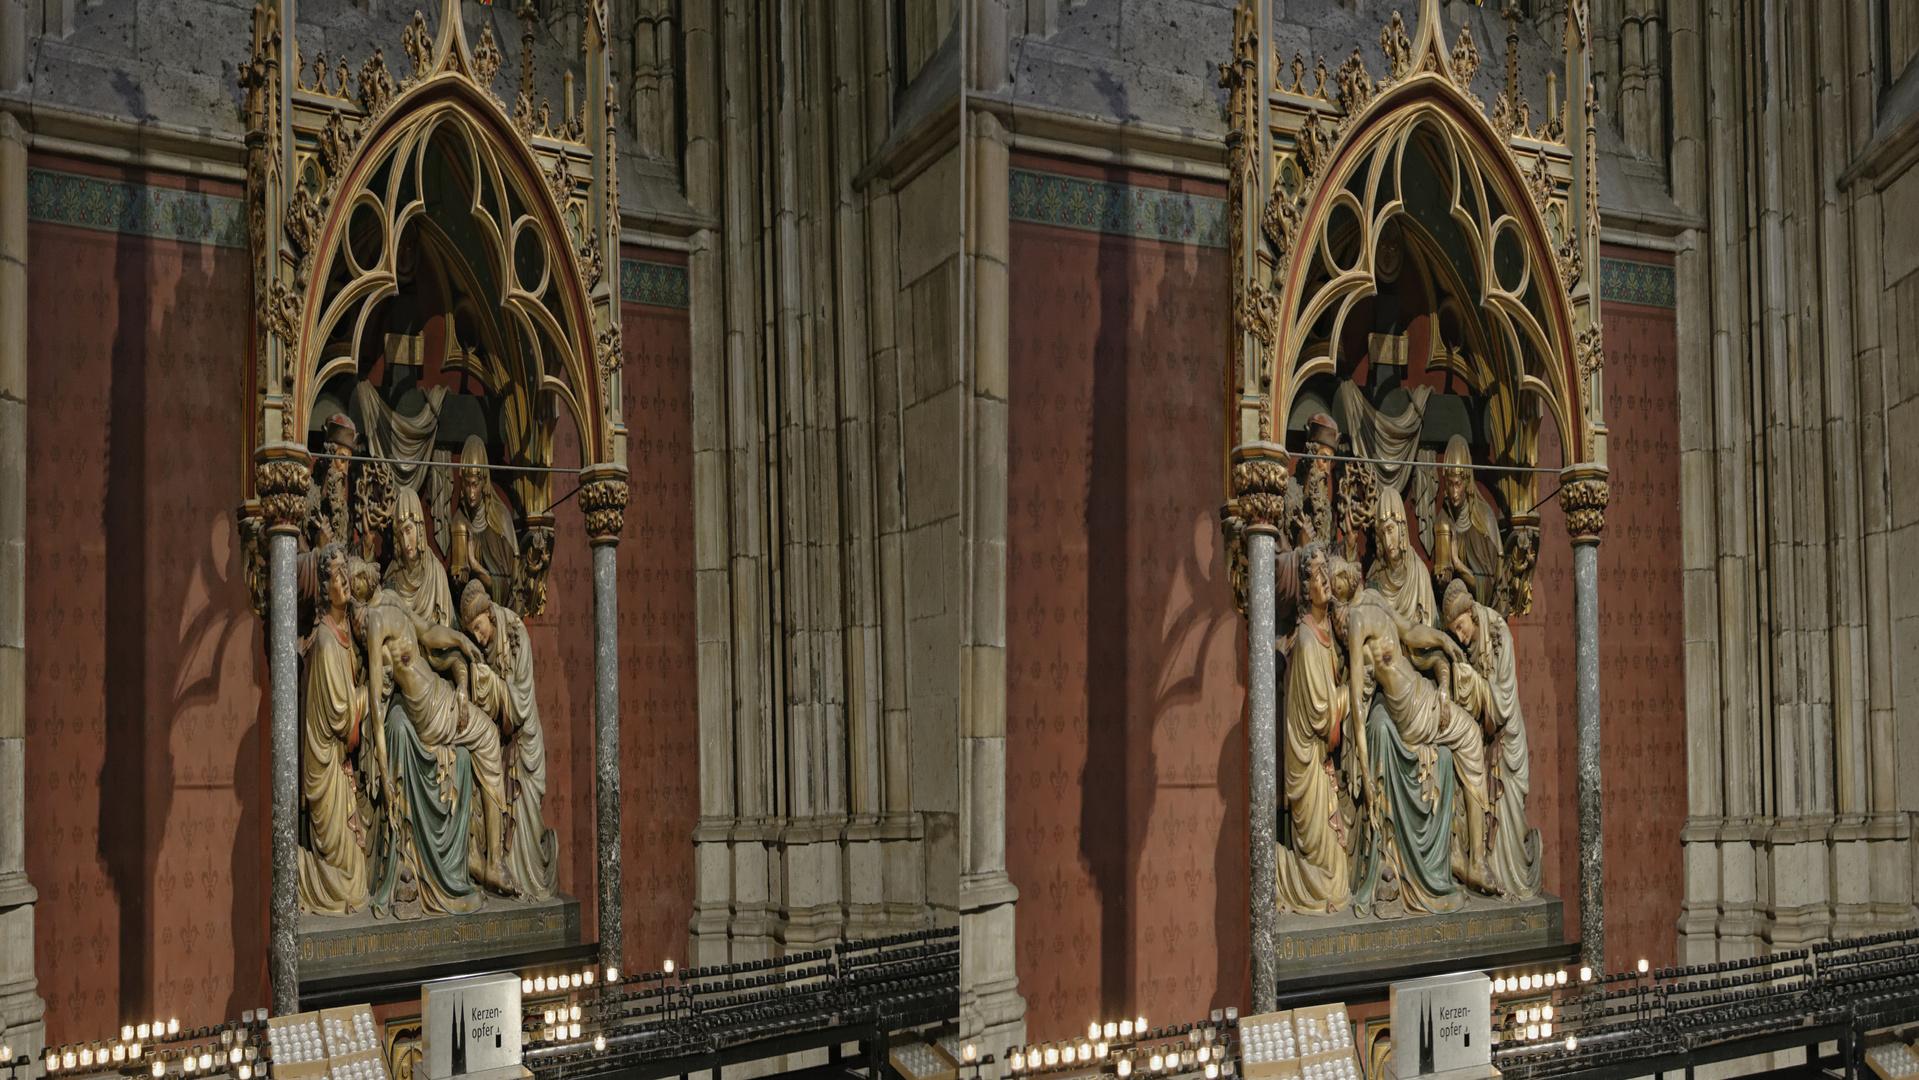 Kölner Dom (3) 3D parallel